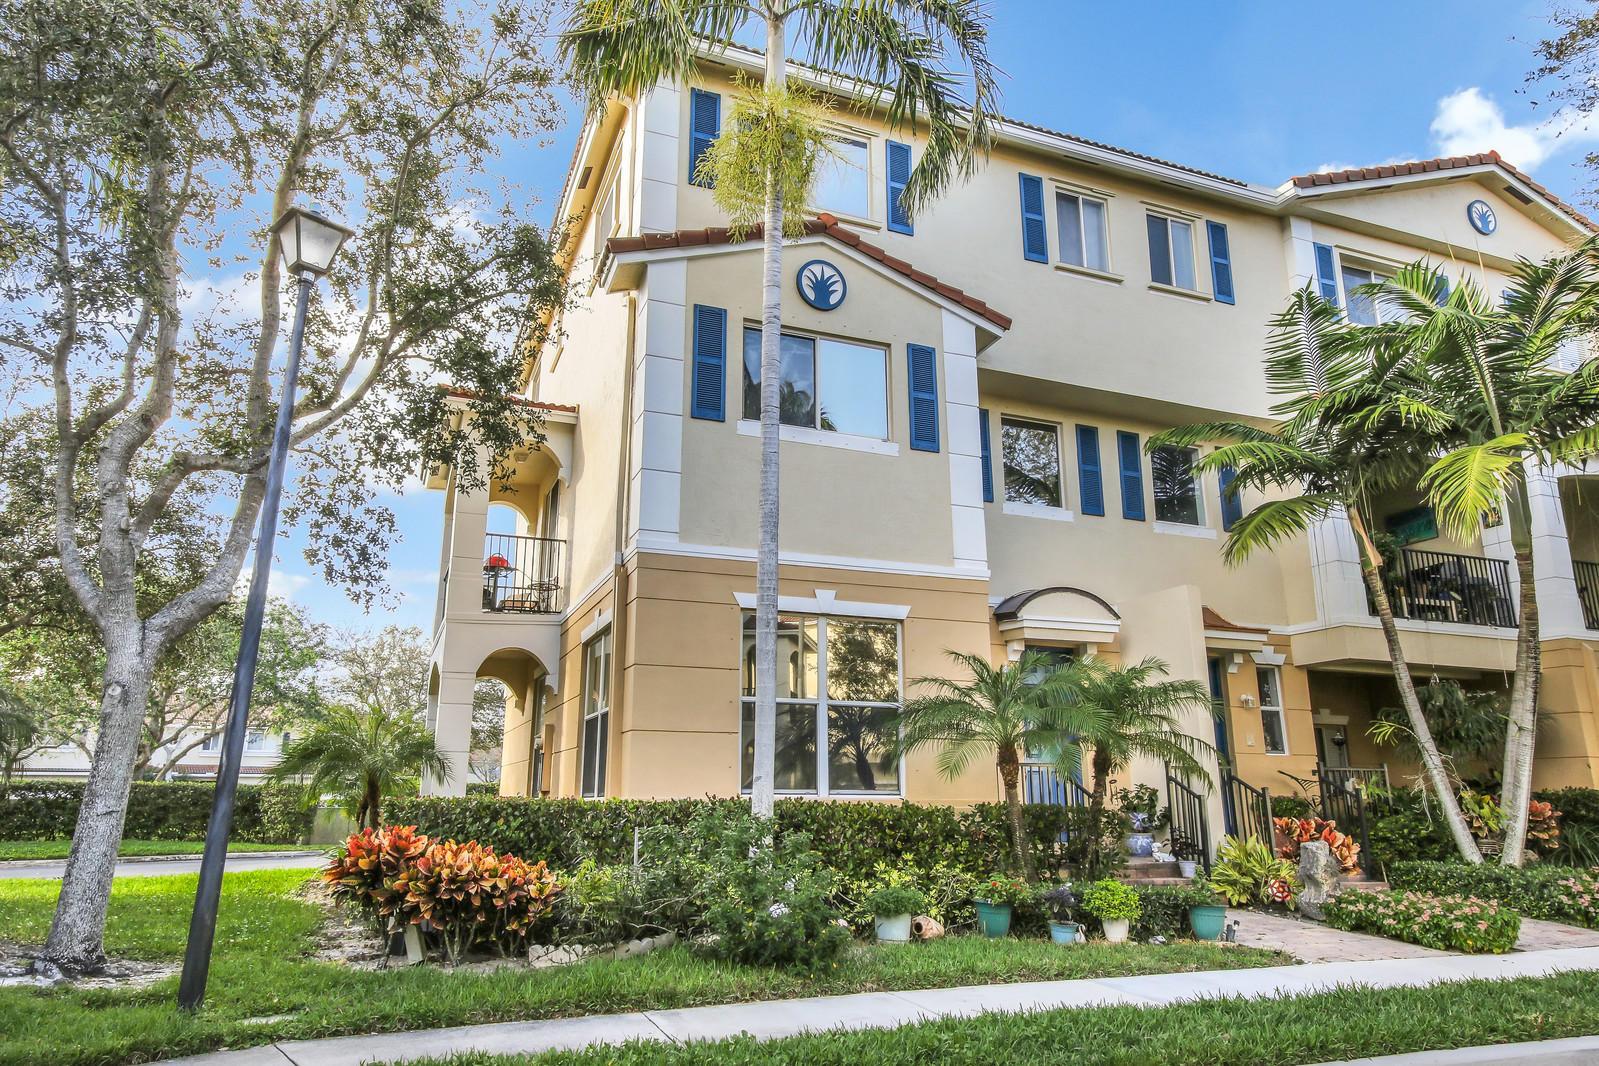 3134 N Oasis Drive Boynton Beach, FL 33426